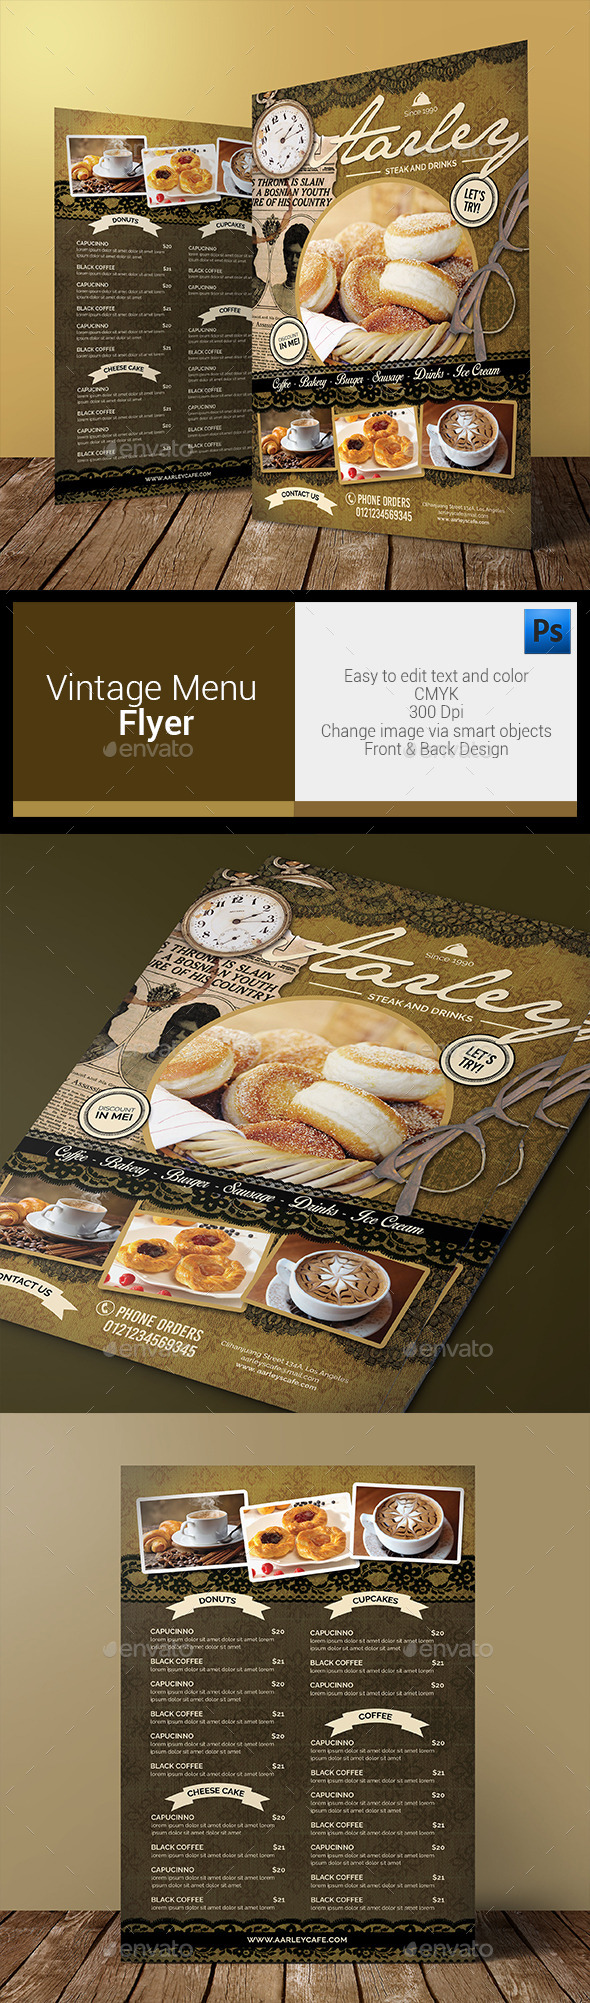 Vintage Menu Flyer - Food Menus Print Templates